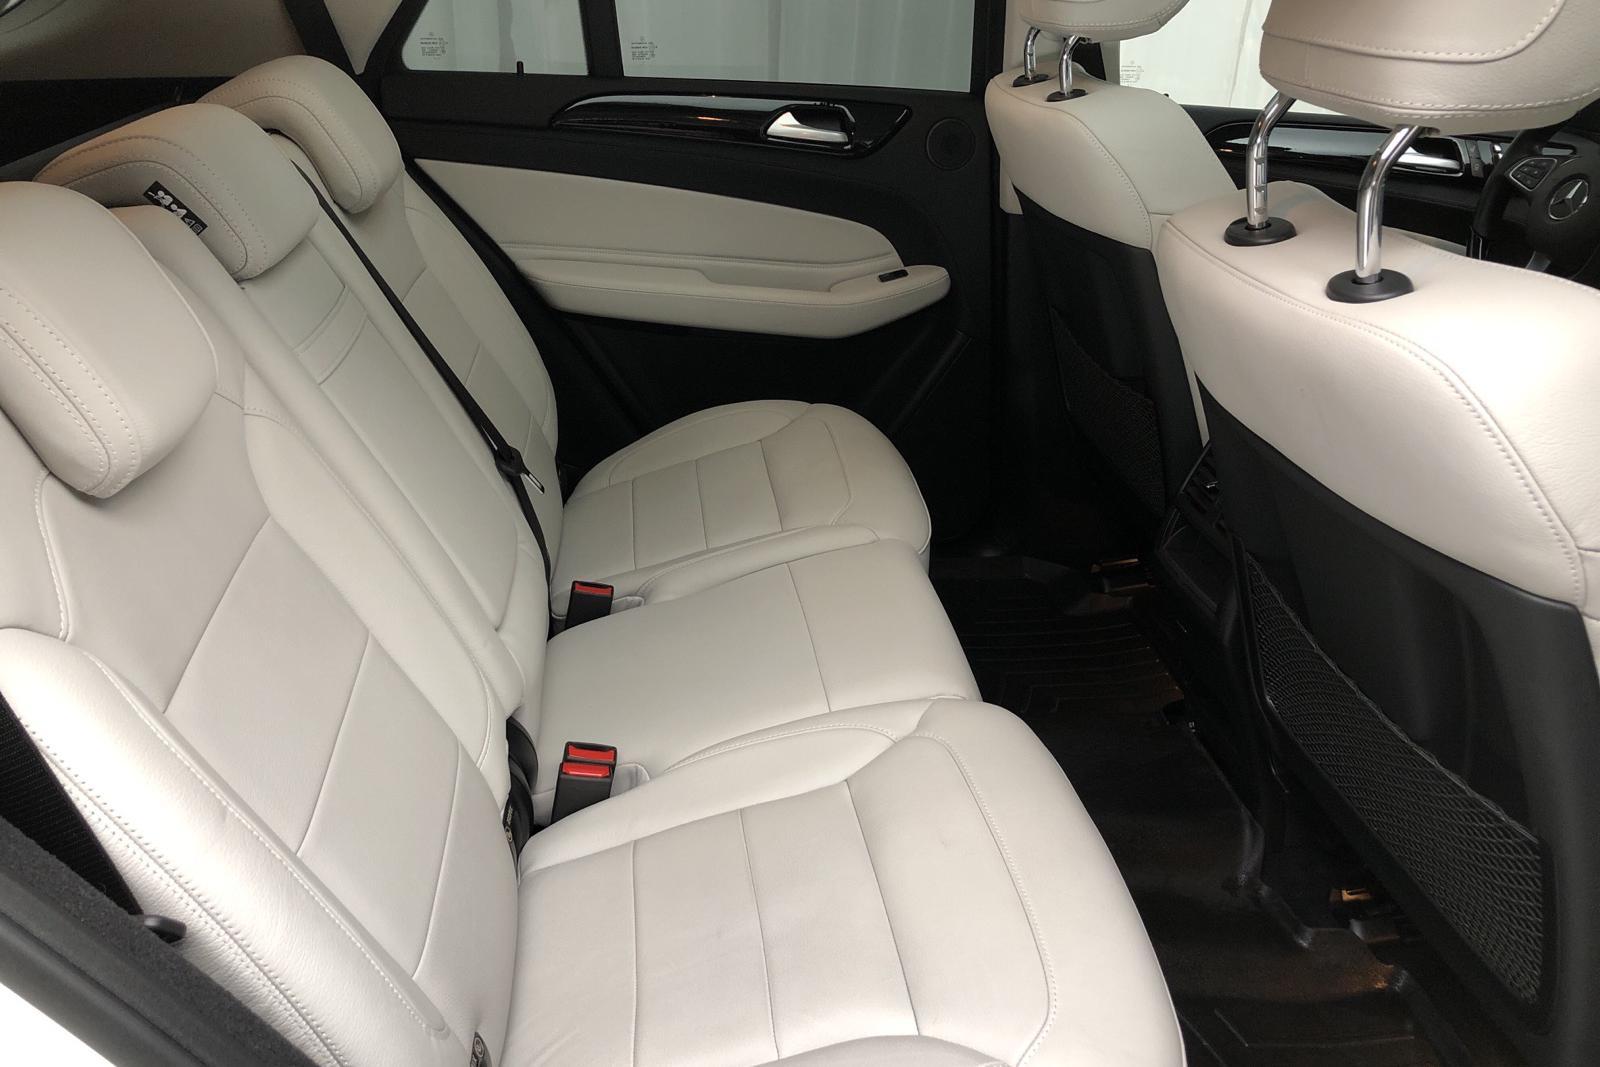 Mercedes GLE 350 d 4MATIC W166 (258hk) - 0 km - white - 2017